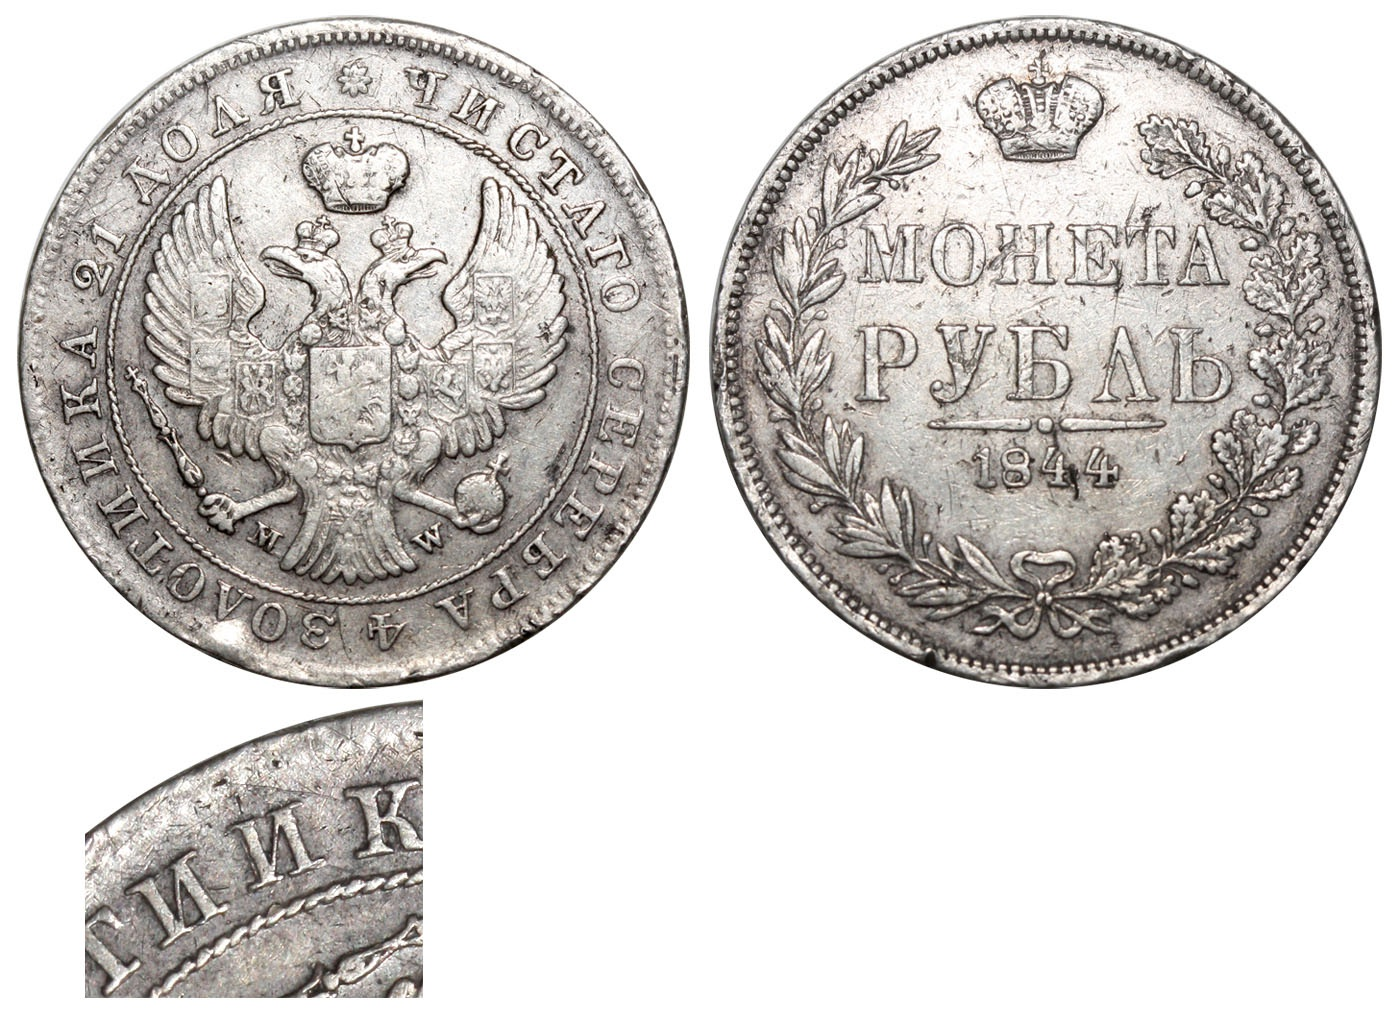 Рубль 1844 MW IIIб-В ЗОЛОТИИКА.jpg